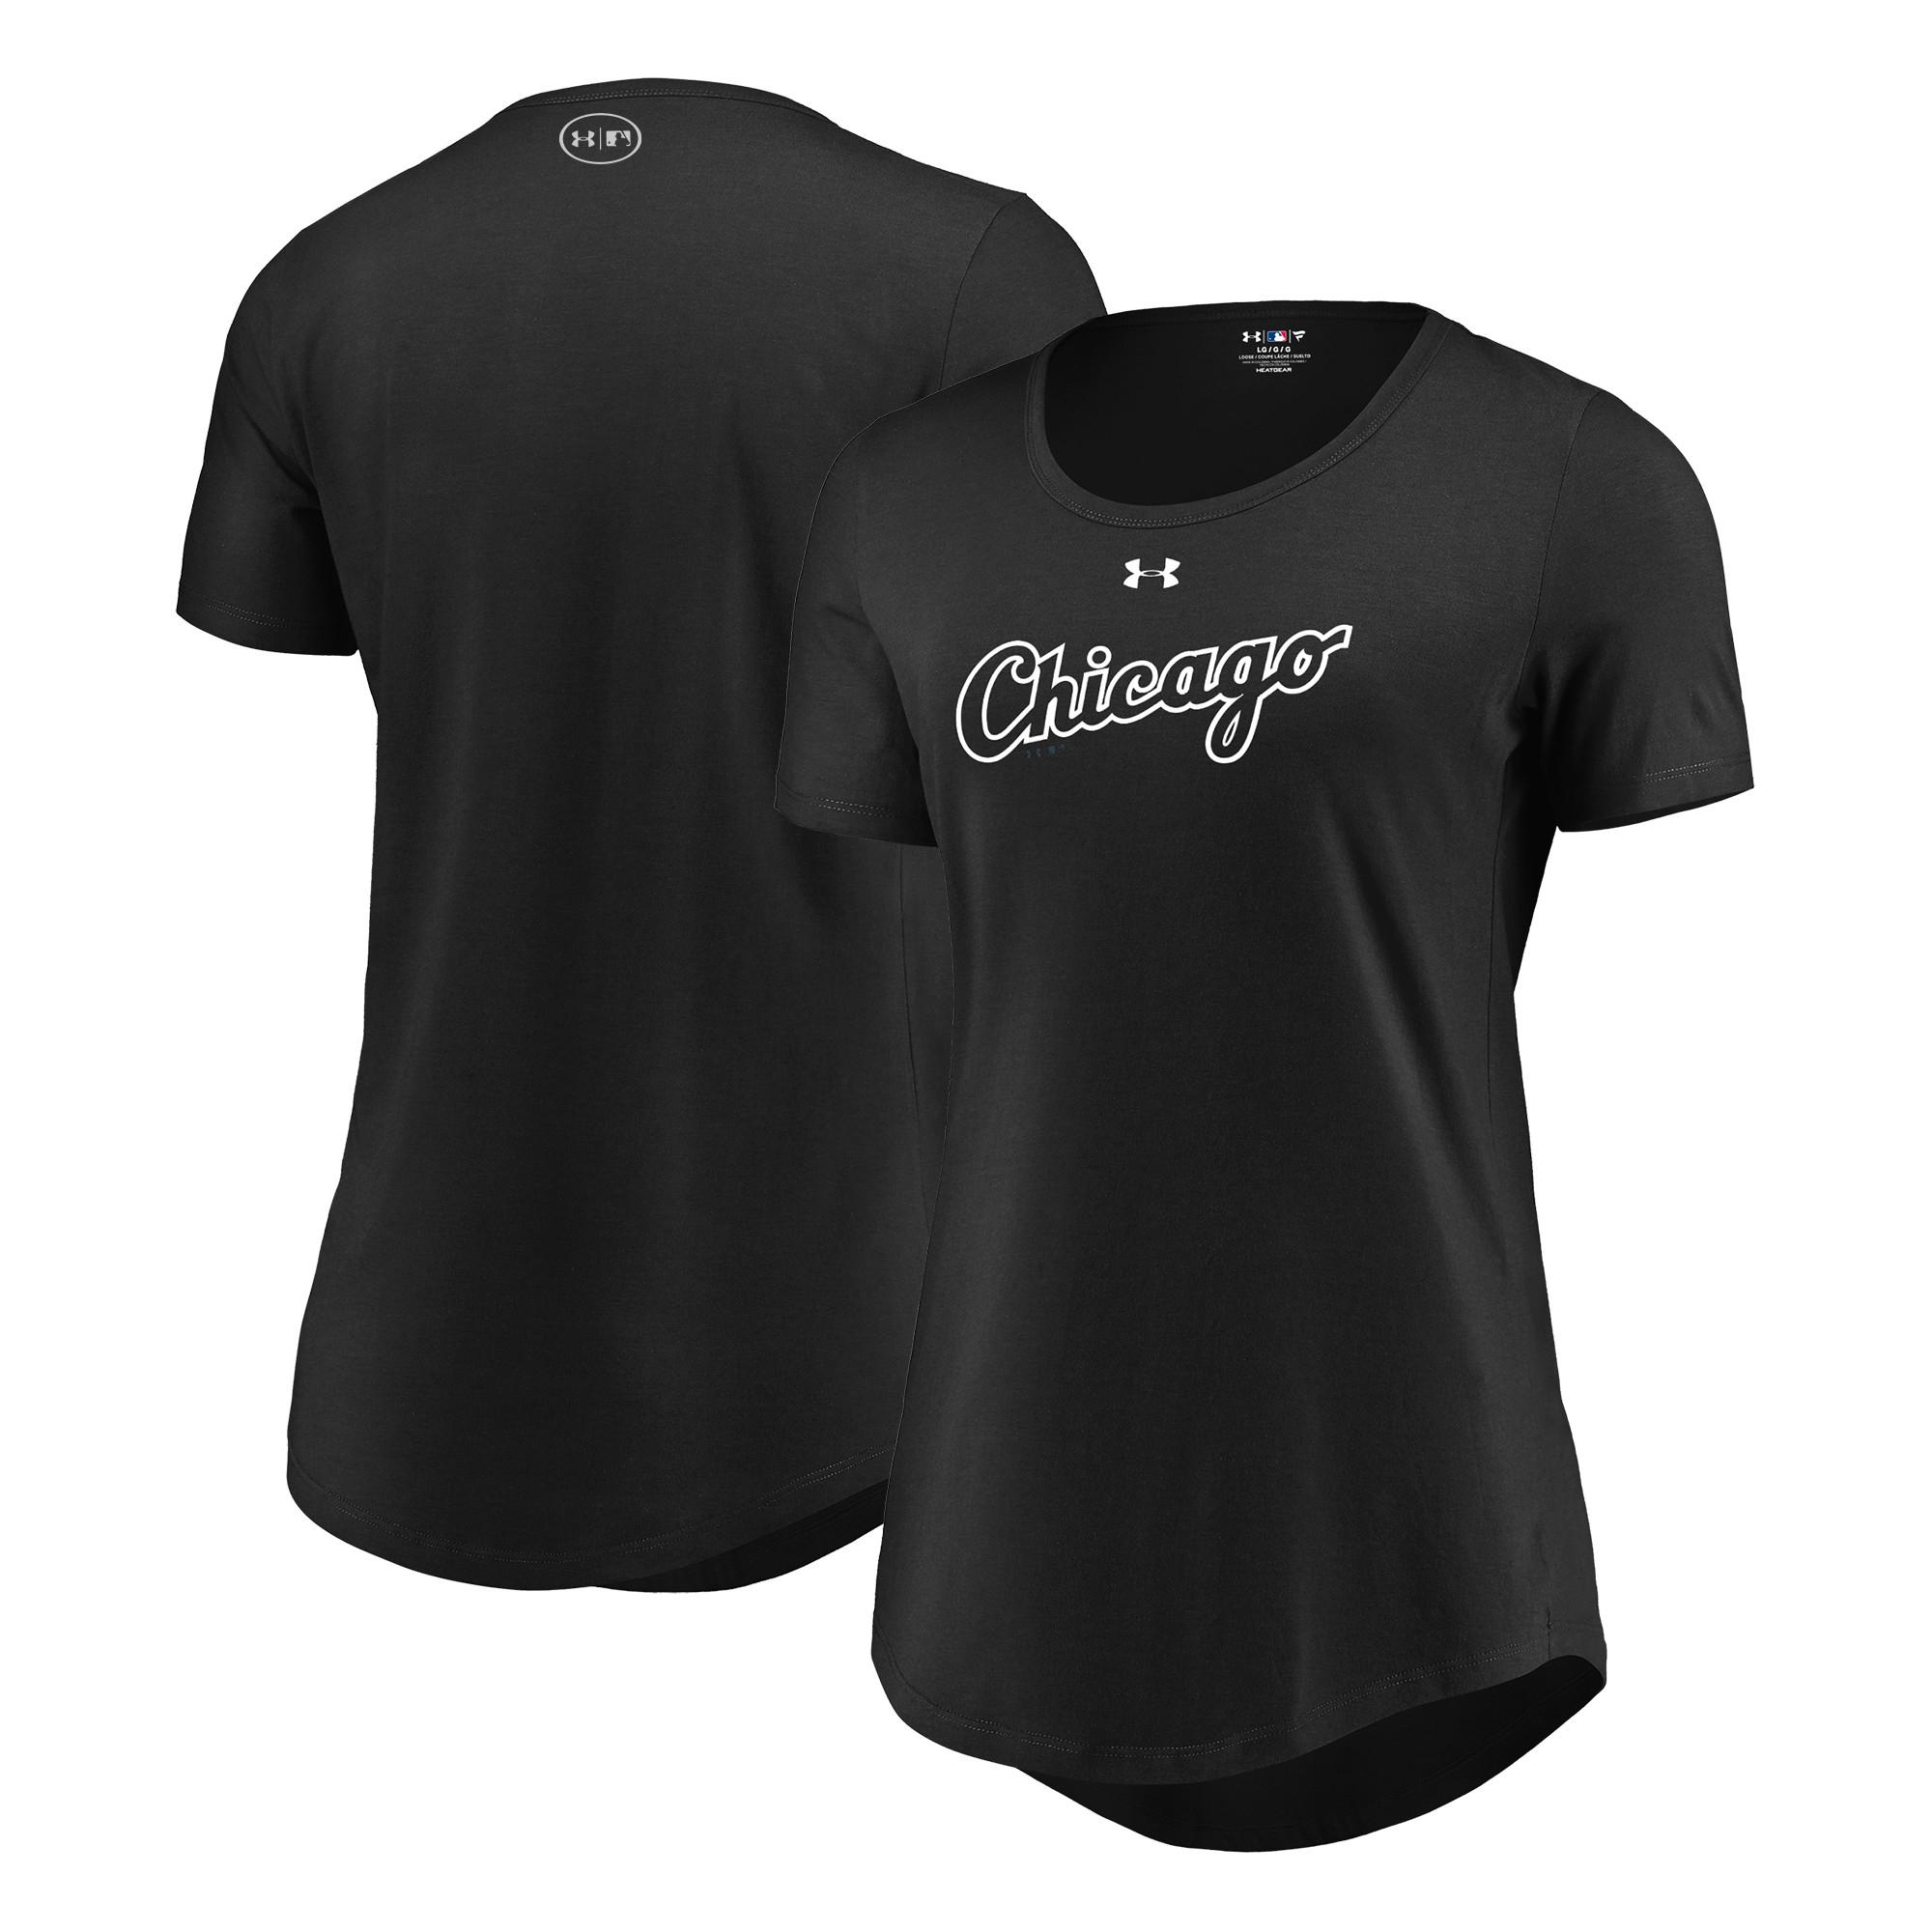 Chicago White Sox Under Armour Women's Passion Road Team Font Scoop Performance Tri-Blend T-Shirt - Black